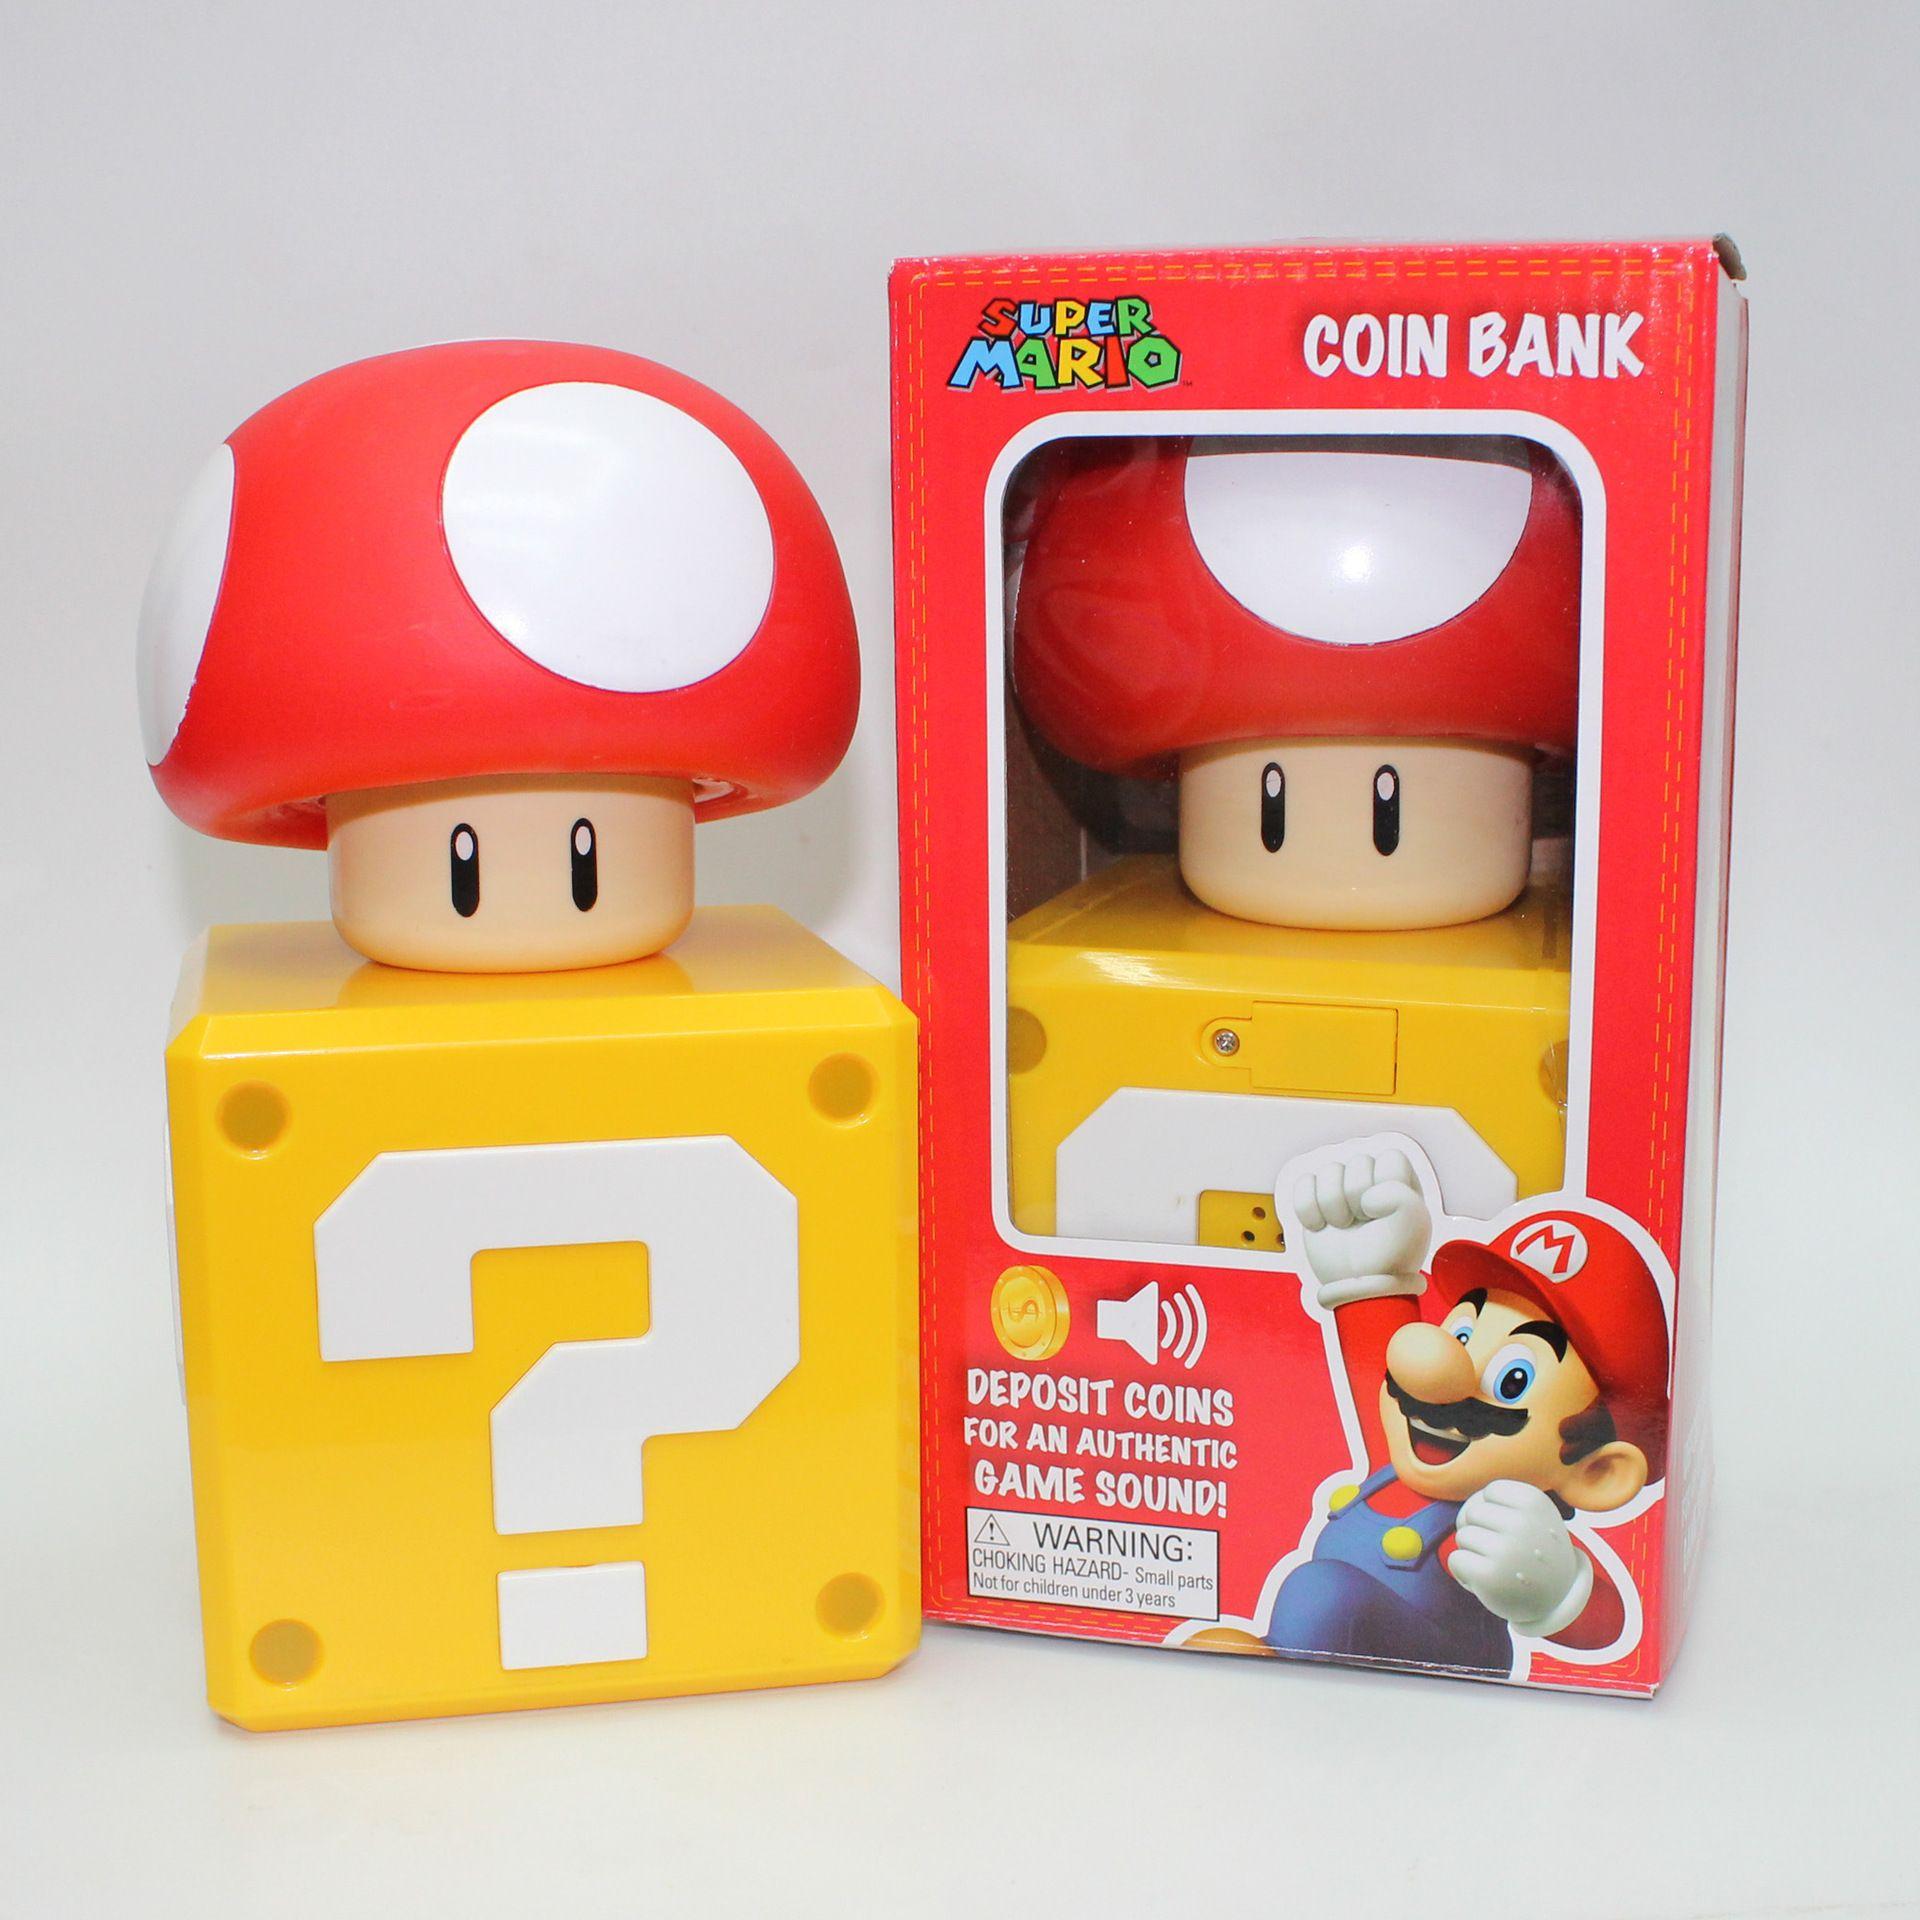 748879a6f3b6 Cheap Super Mario Bros figuras de acción caja de sonido Mario Anime figuras  juguetes calientes Pvc figura de dibujos animados Kid Brinquedo regalo, ...